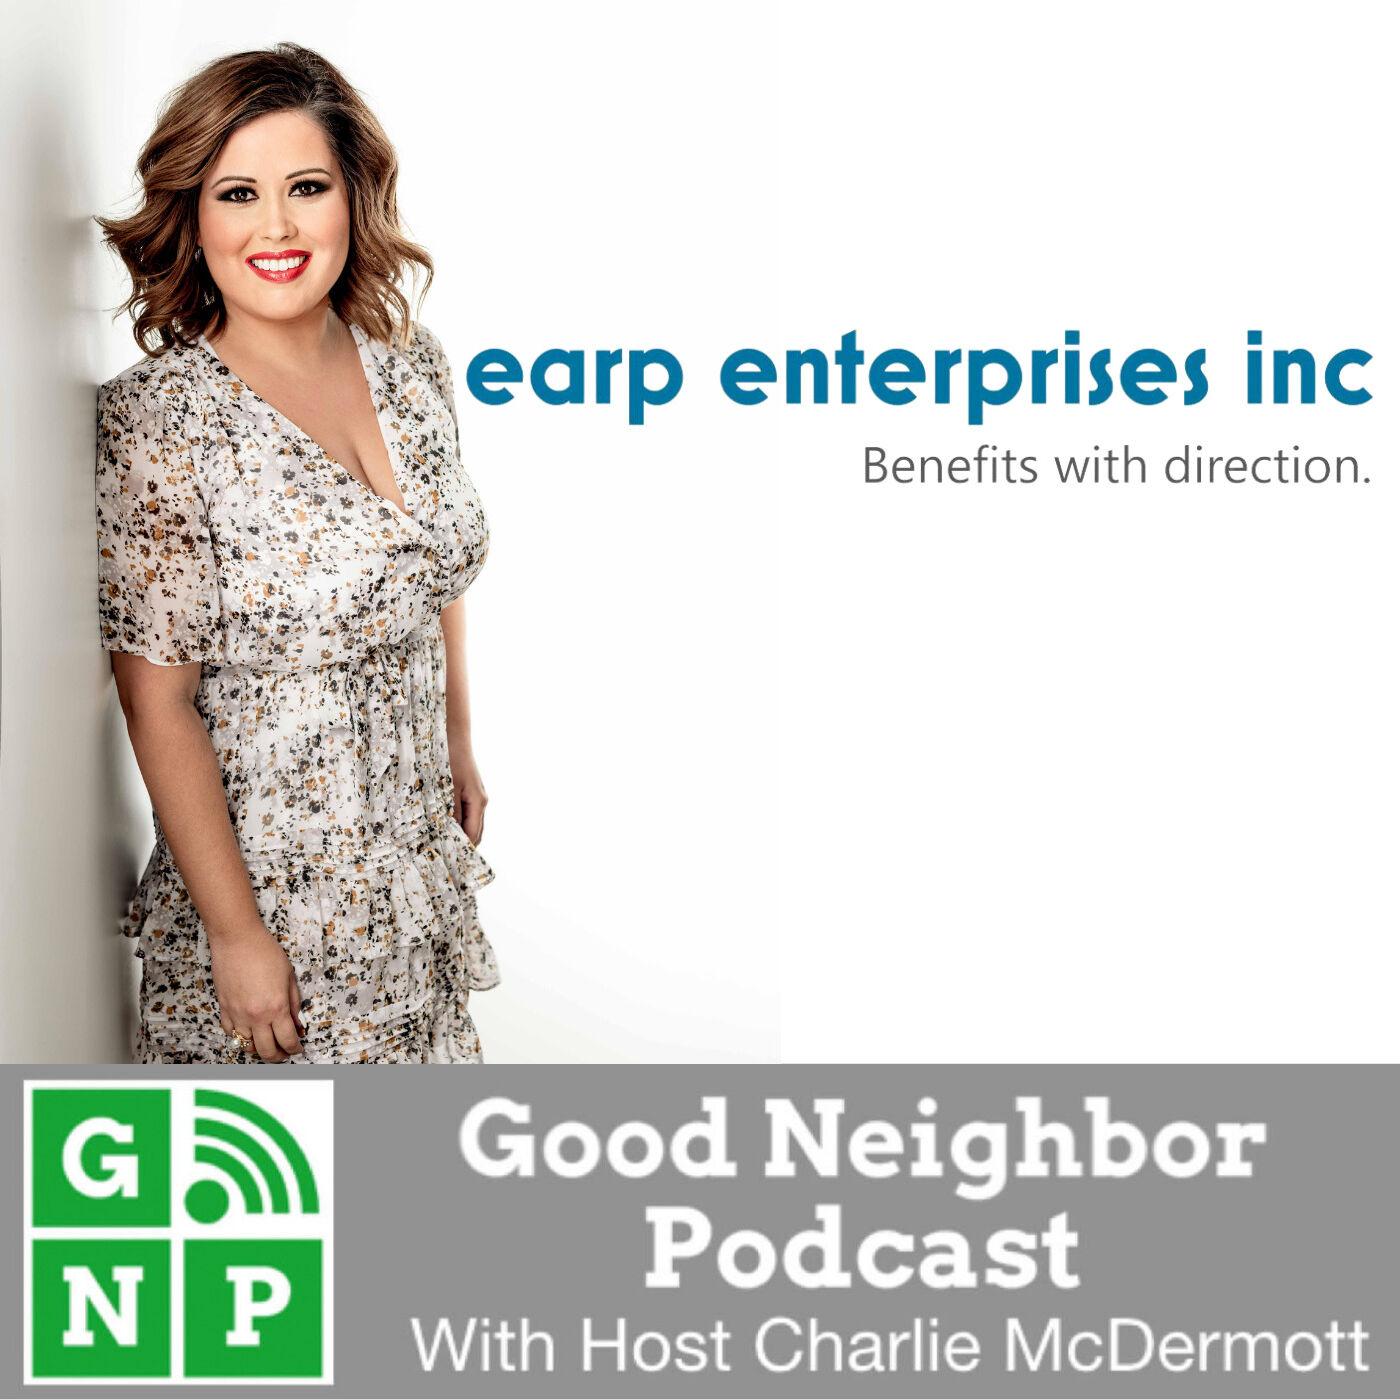 EP #484: Earp Enterprises with Rachel Earp